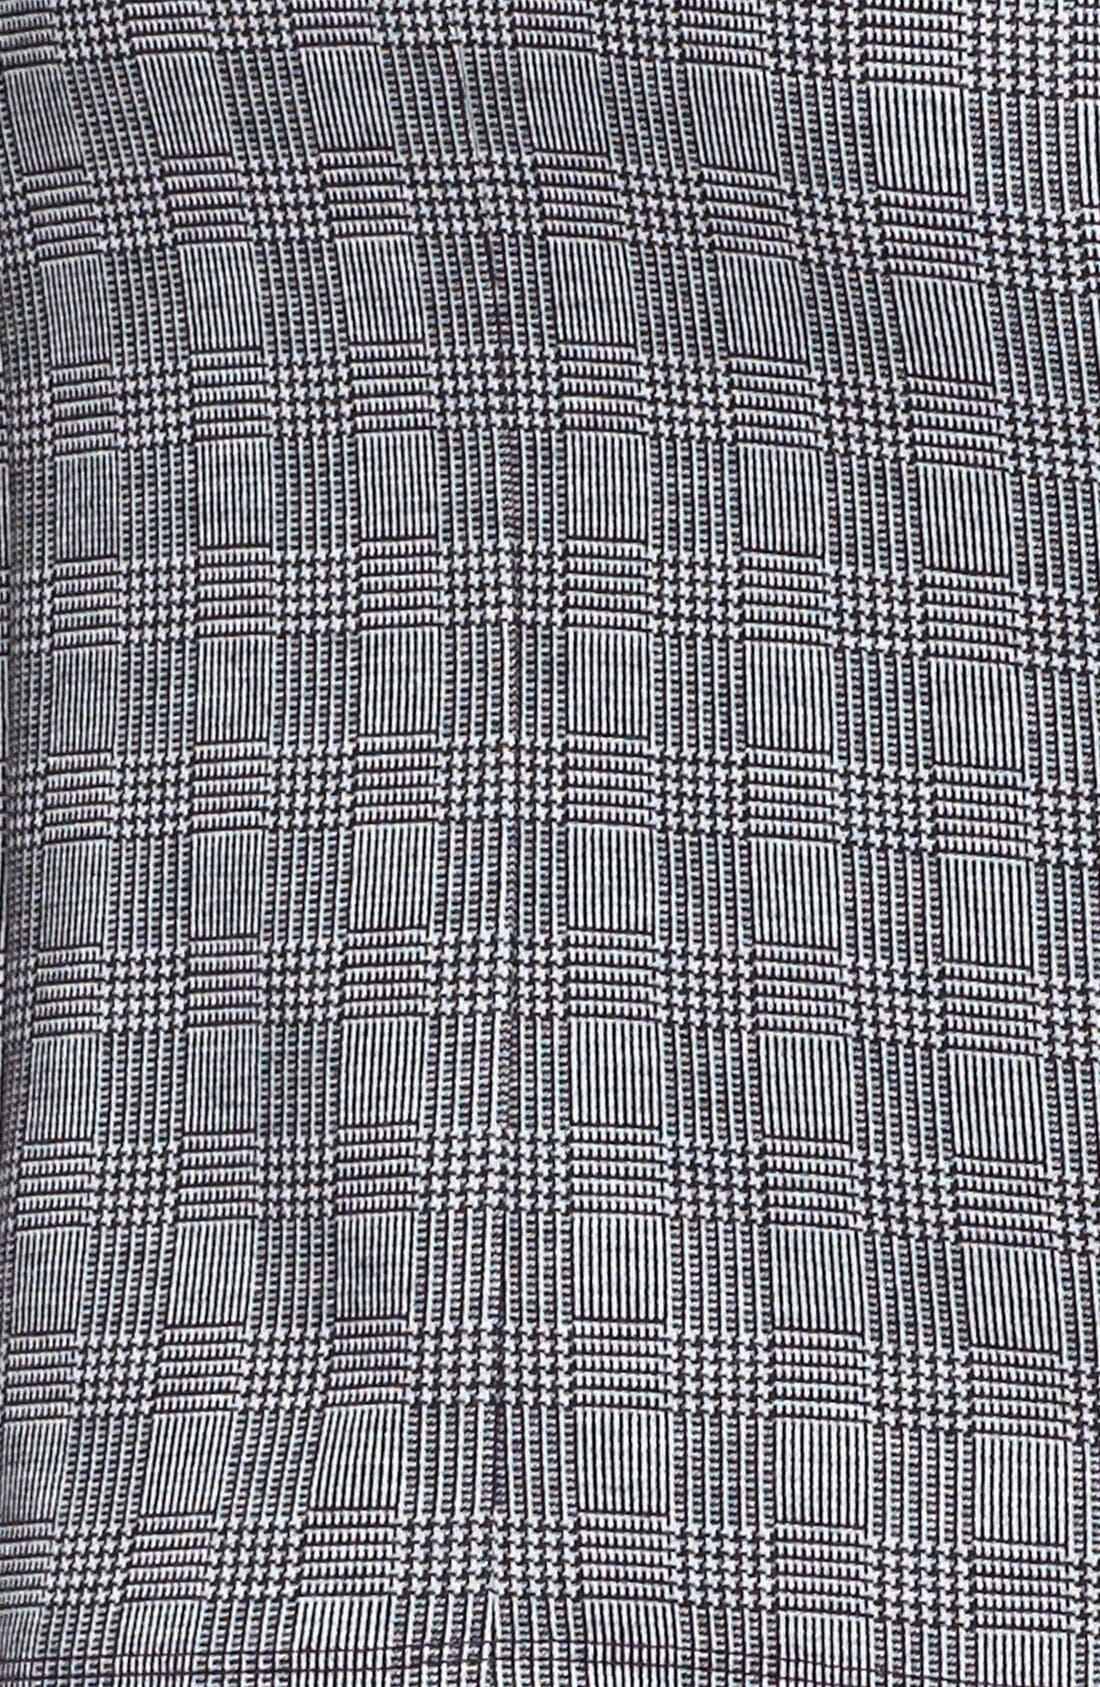 Alternate Image 3  - Vince Camuto Side Zip Glen Plaid Pencil Skirt (Petite) (Nordstrom Exclusive)